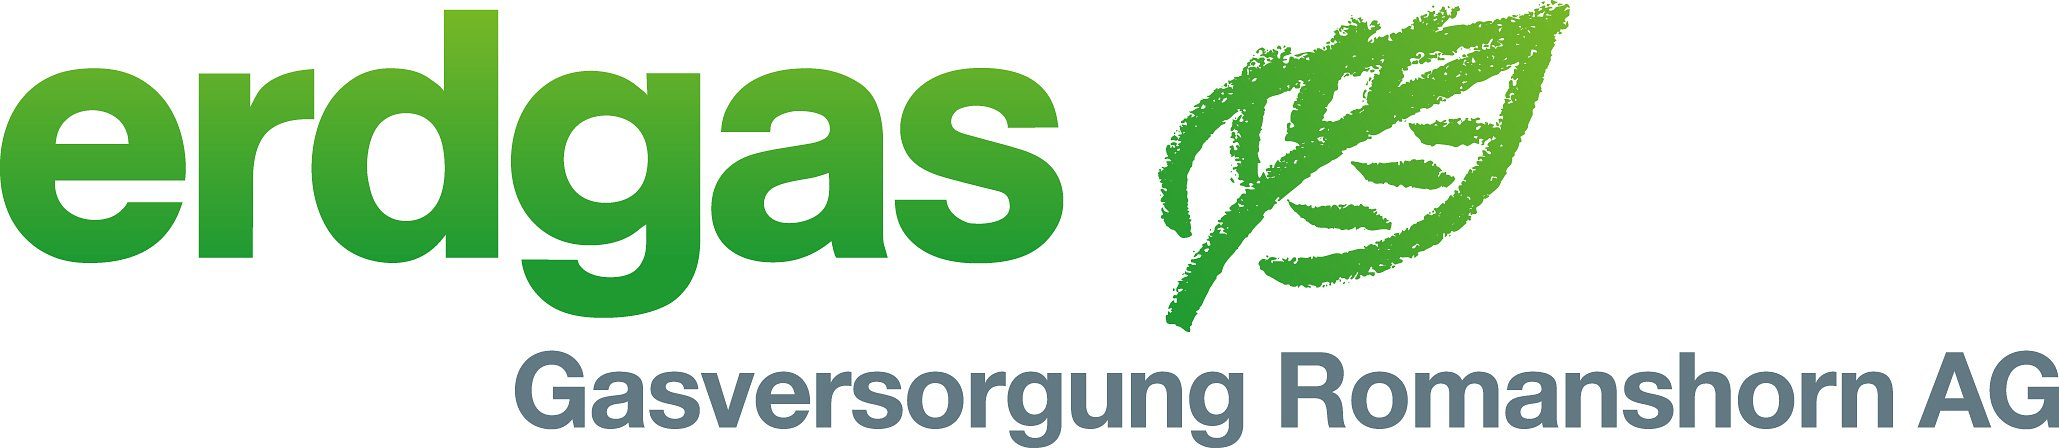 Gasversorgung Romanshorn AG